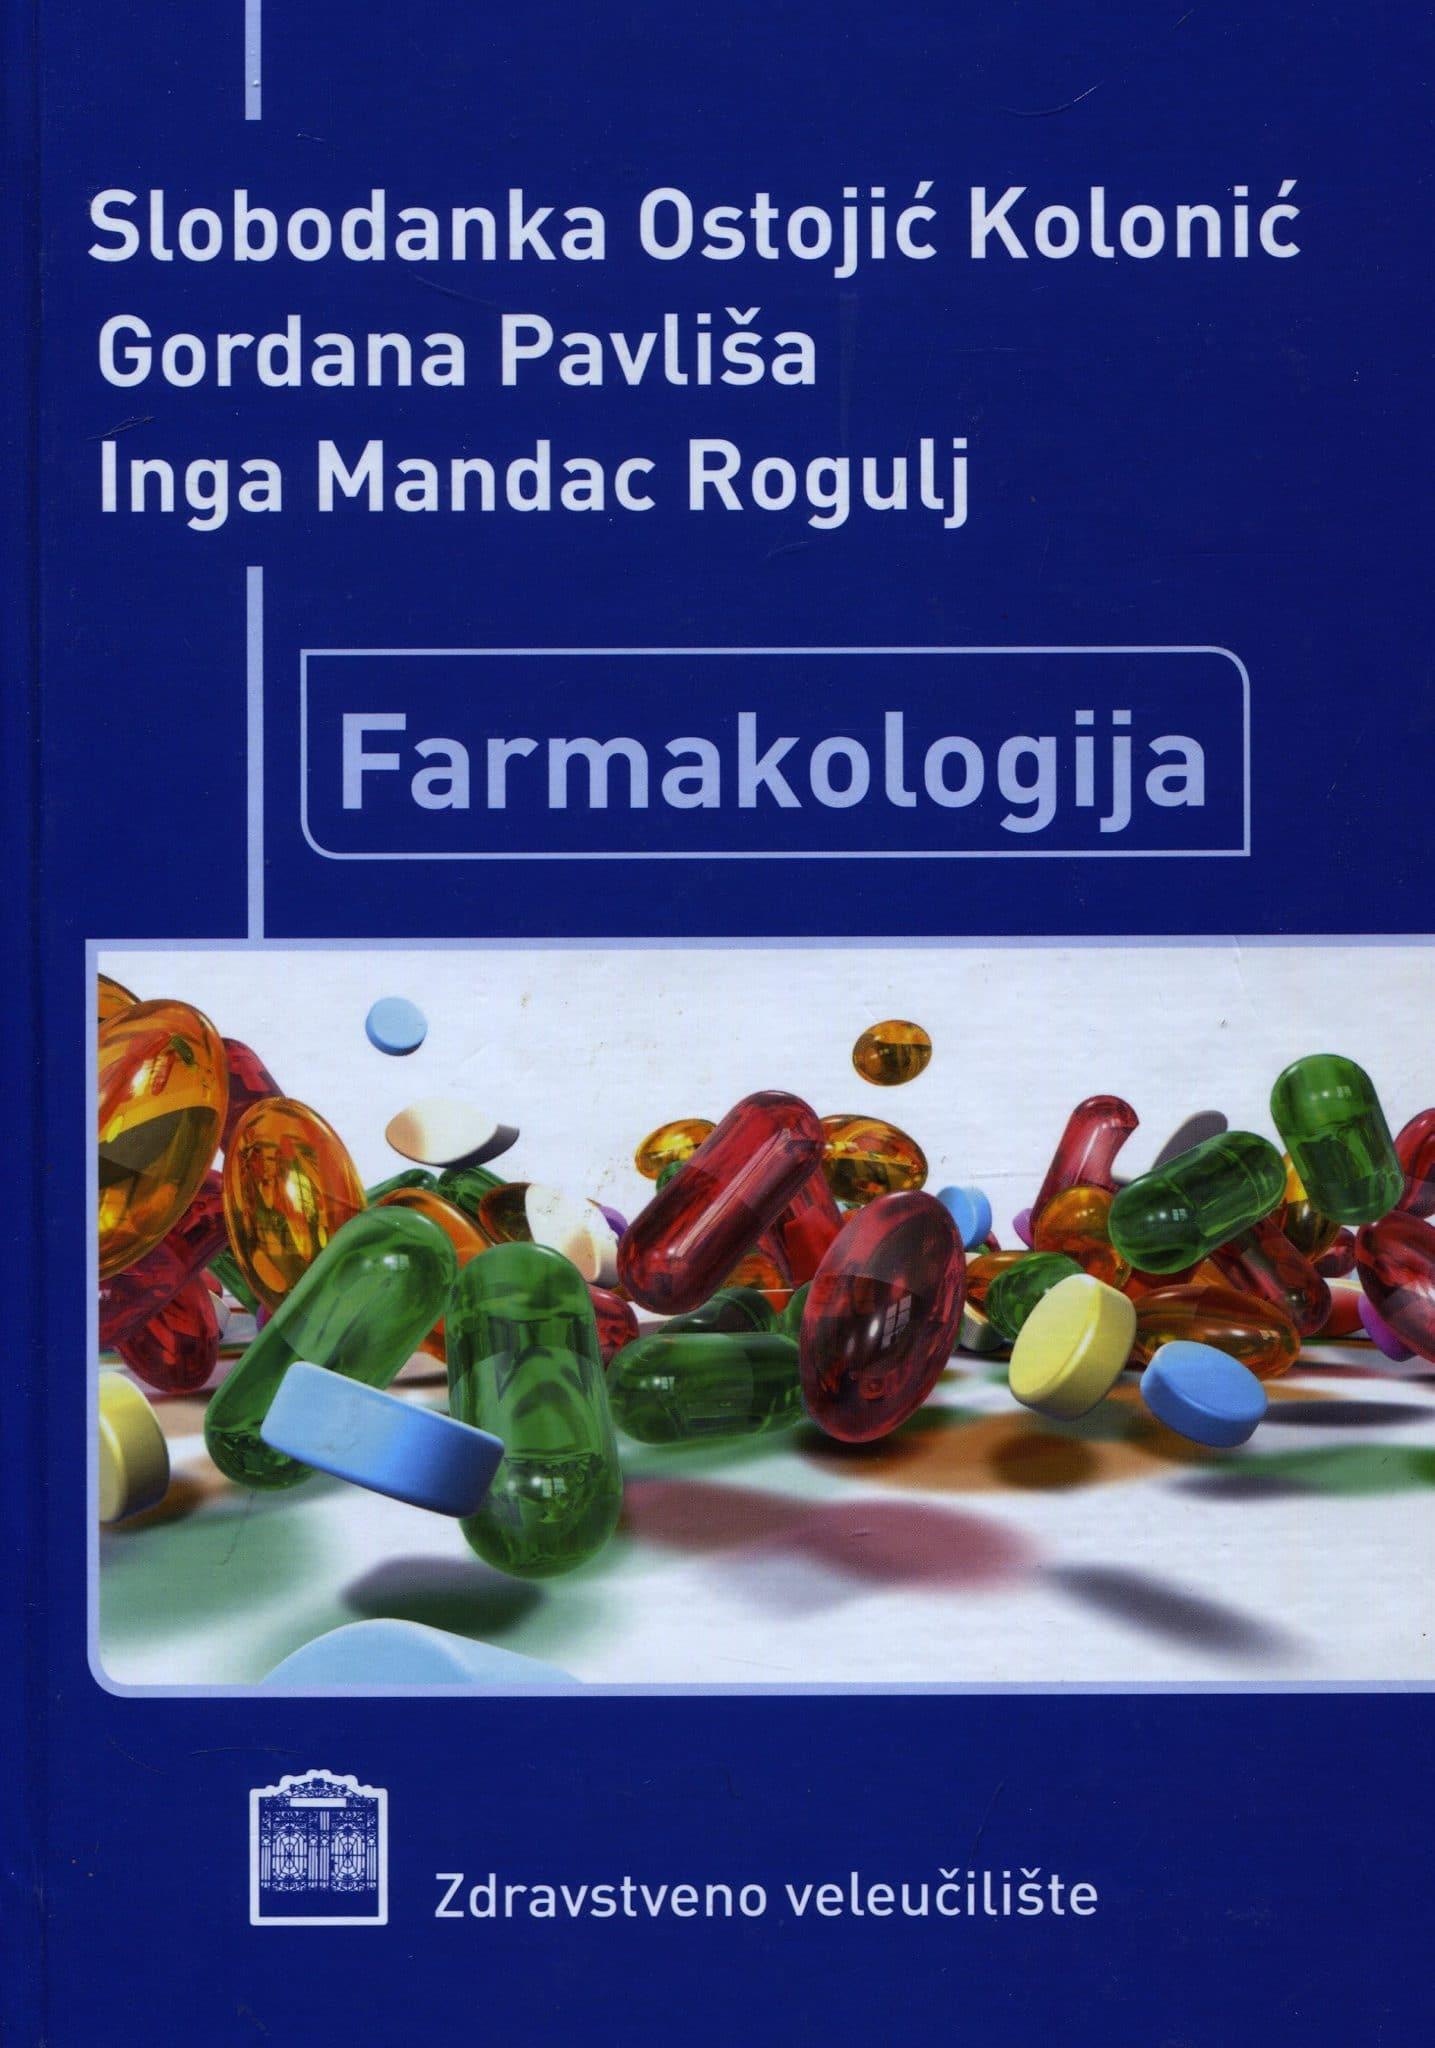 Slobodanka Ostojić Kolonić, Gordana Pavliša, Inga Mandac Rogulj - Farmakologija